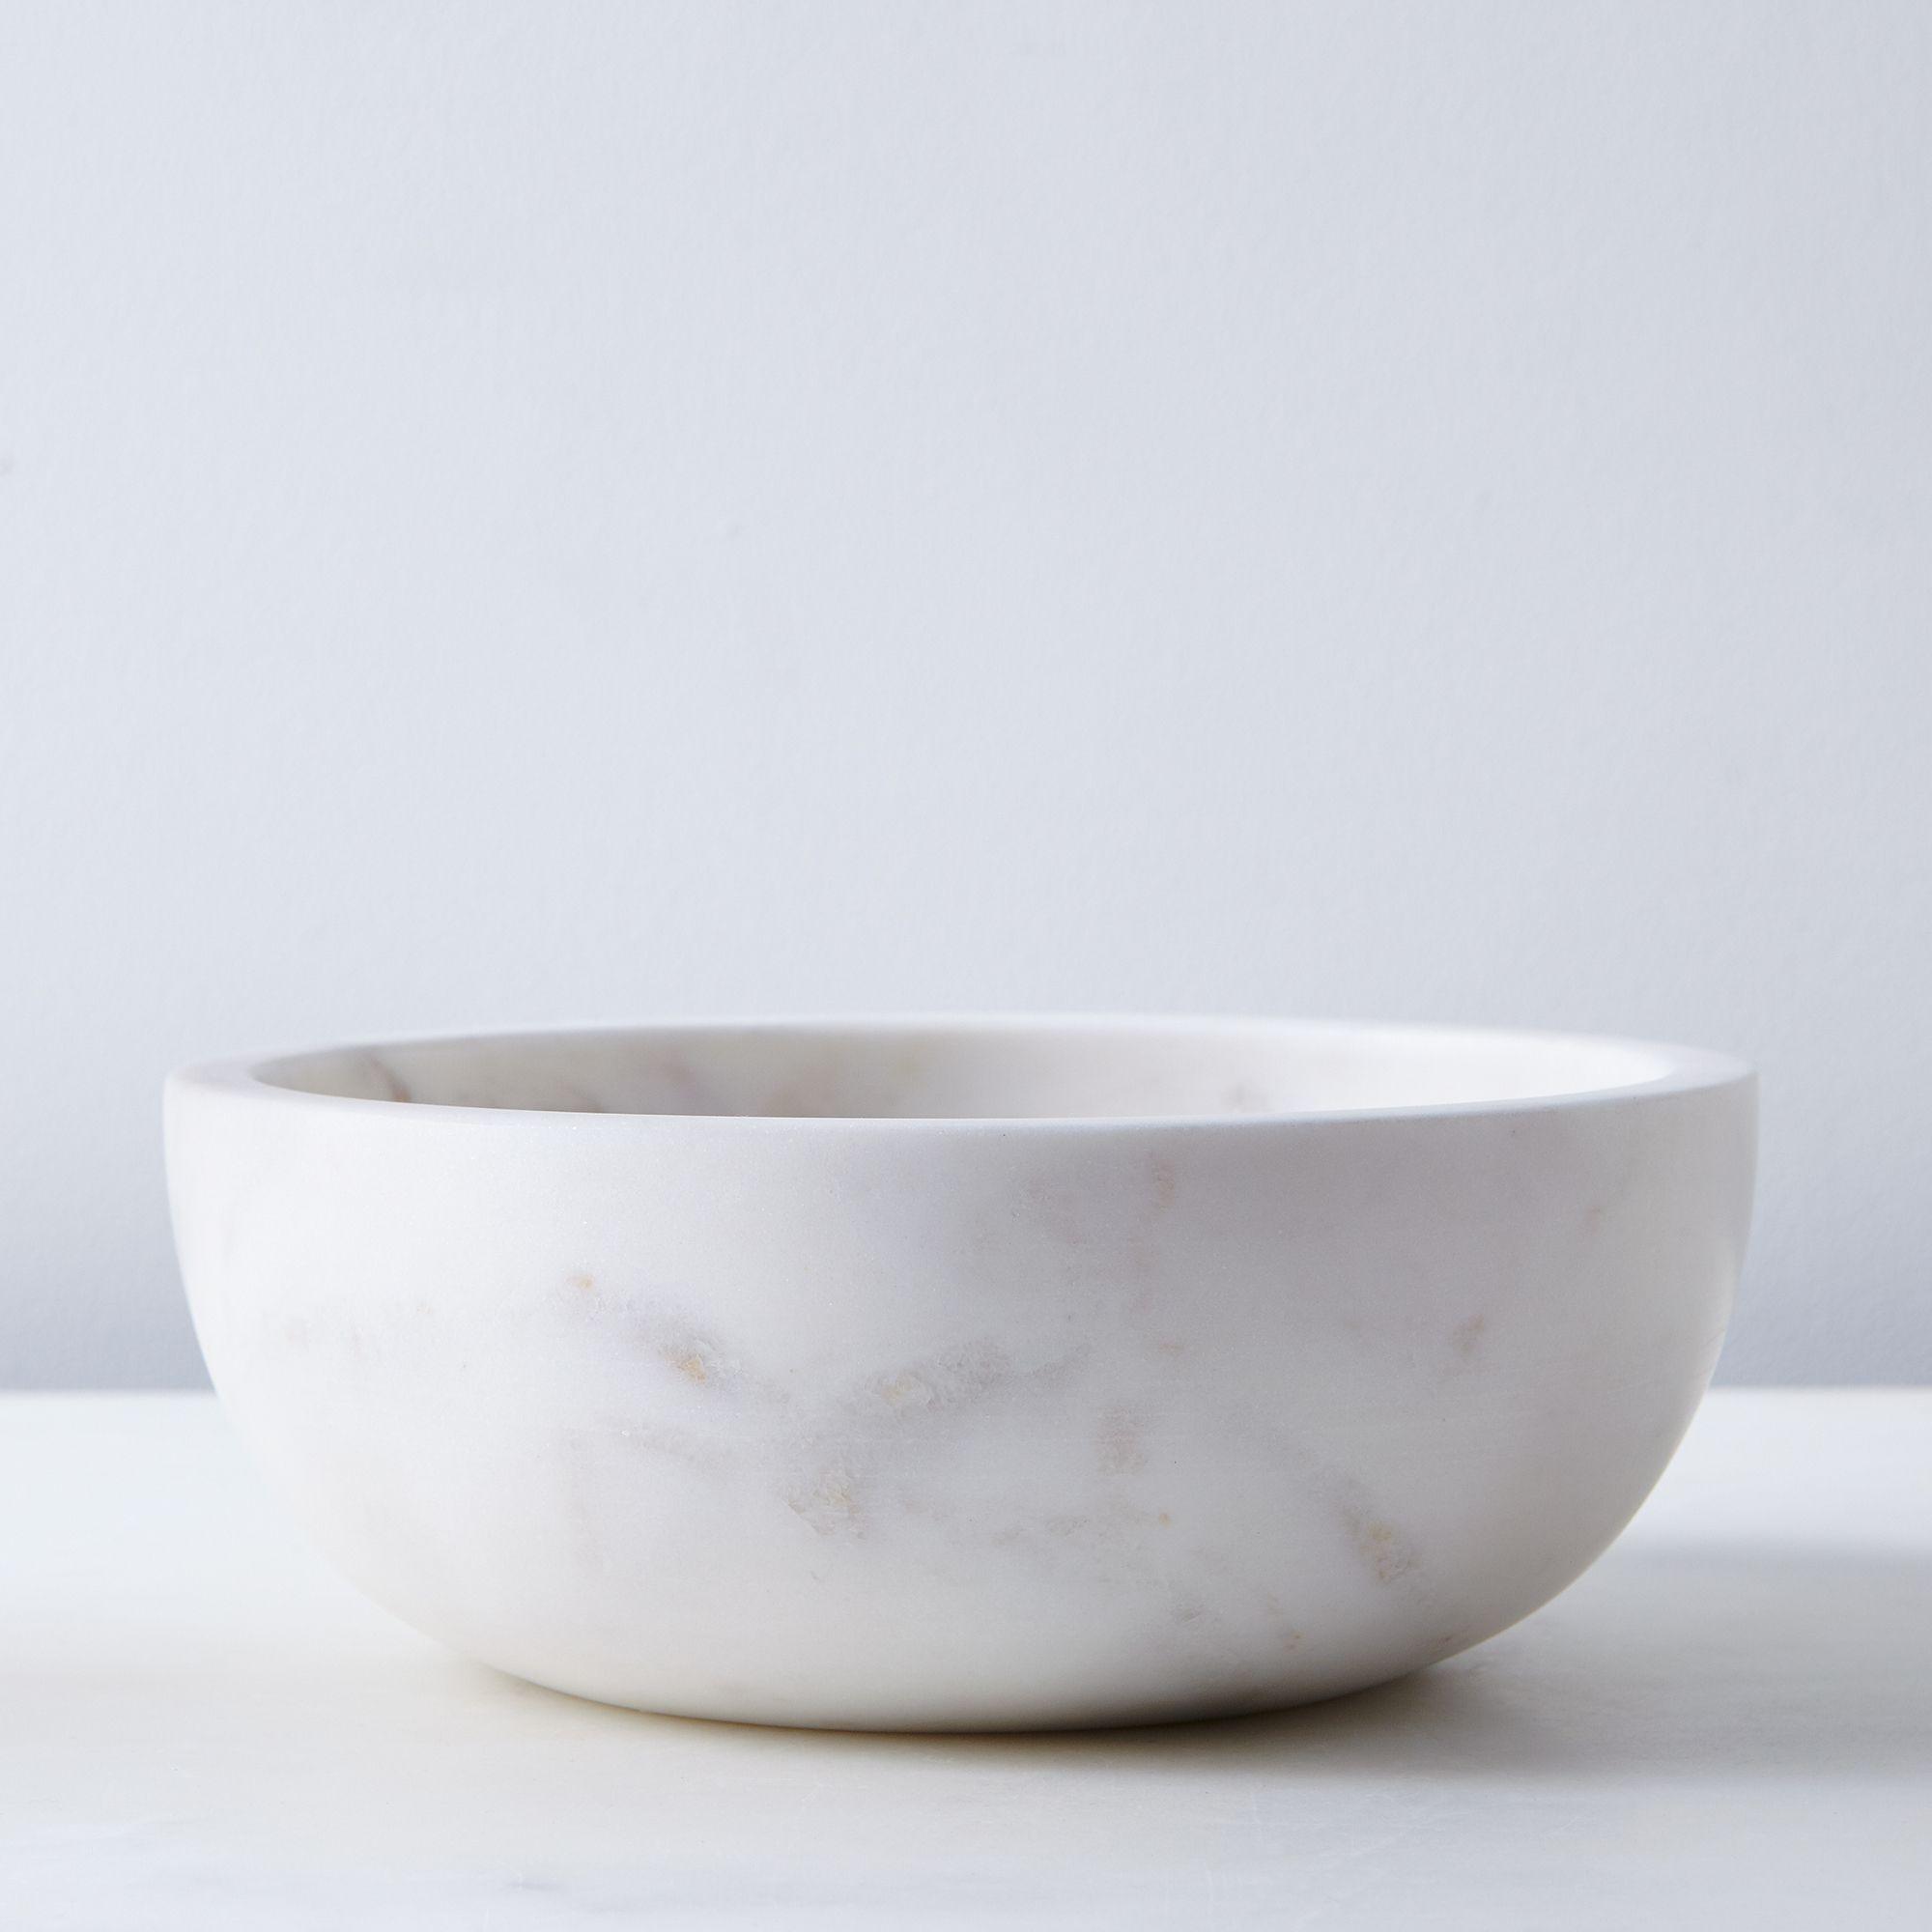 E77f7795 b452 4d3b 9f7b bd4ecca28d4b  2016 0610 hawkins new york marble nesting bowls large silo rocky luten 004